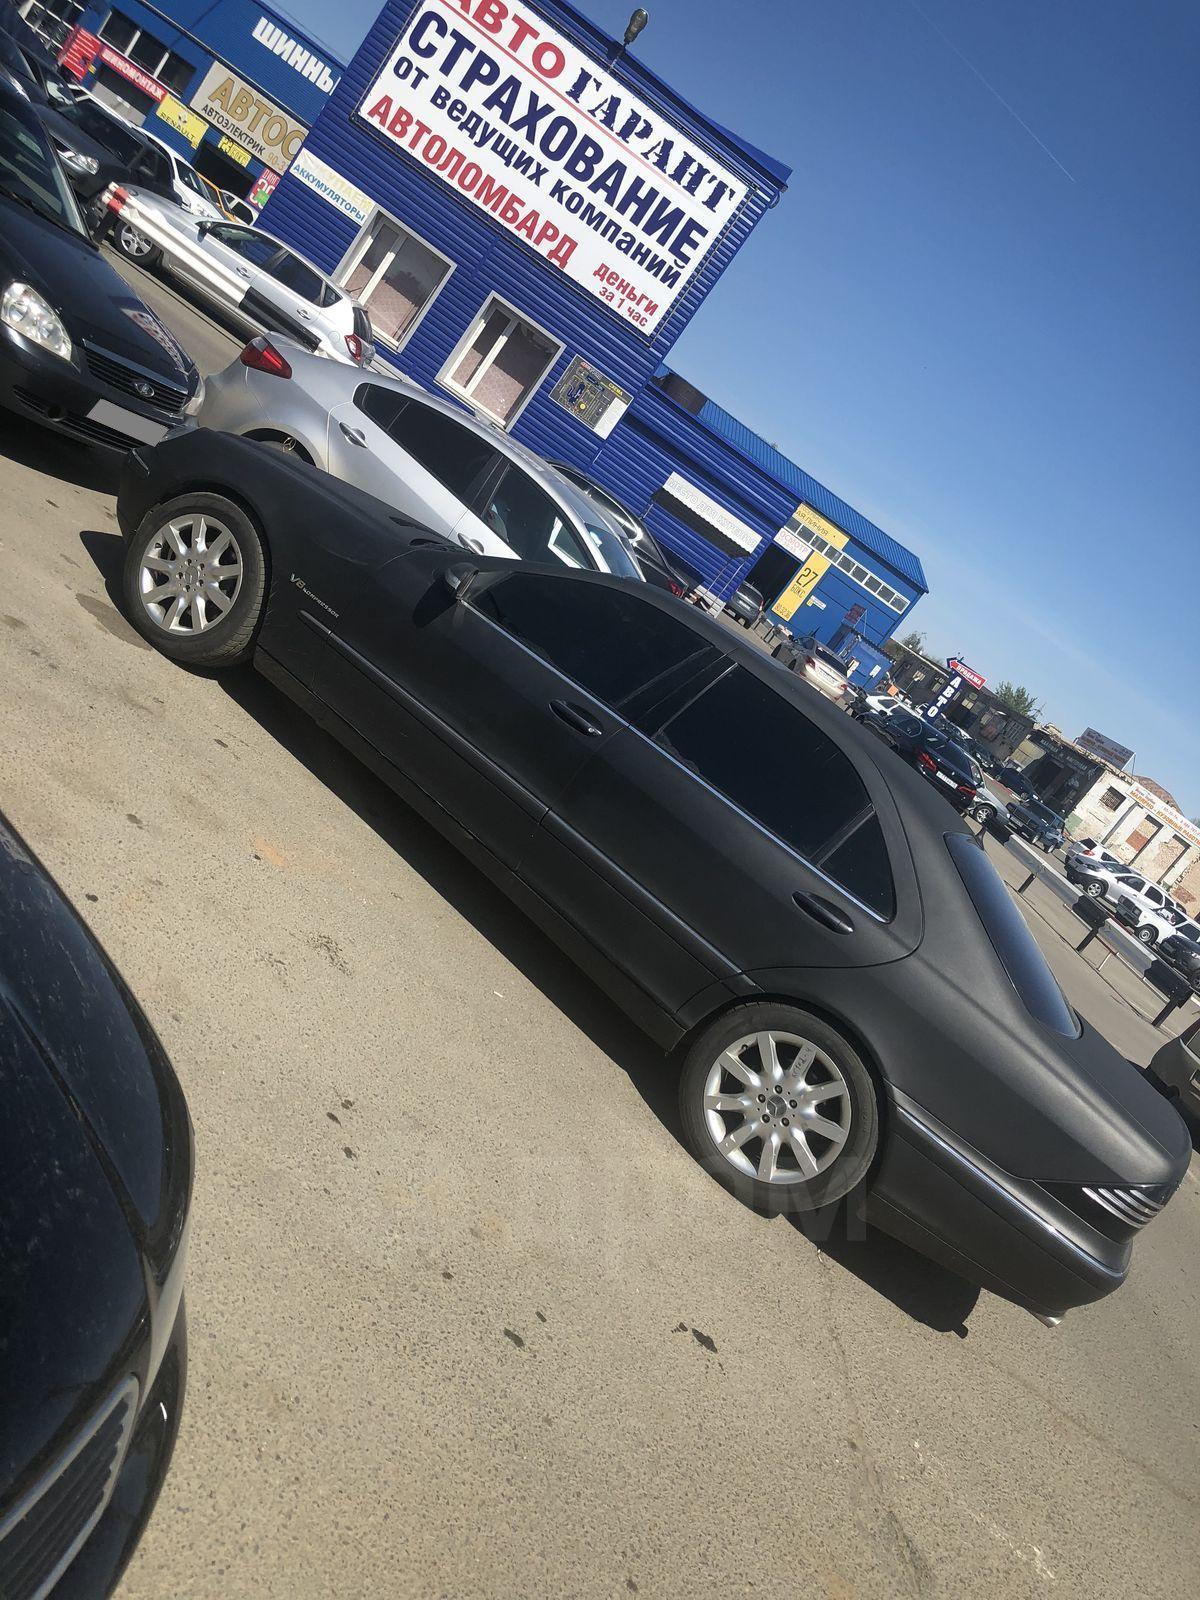 Автоломбард продажа оренбург документы на автомобиль в залоге у банка